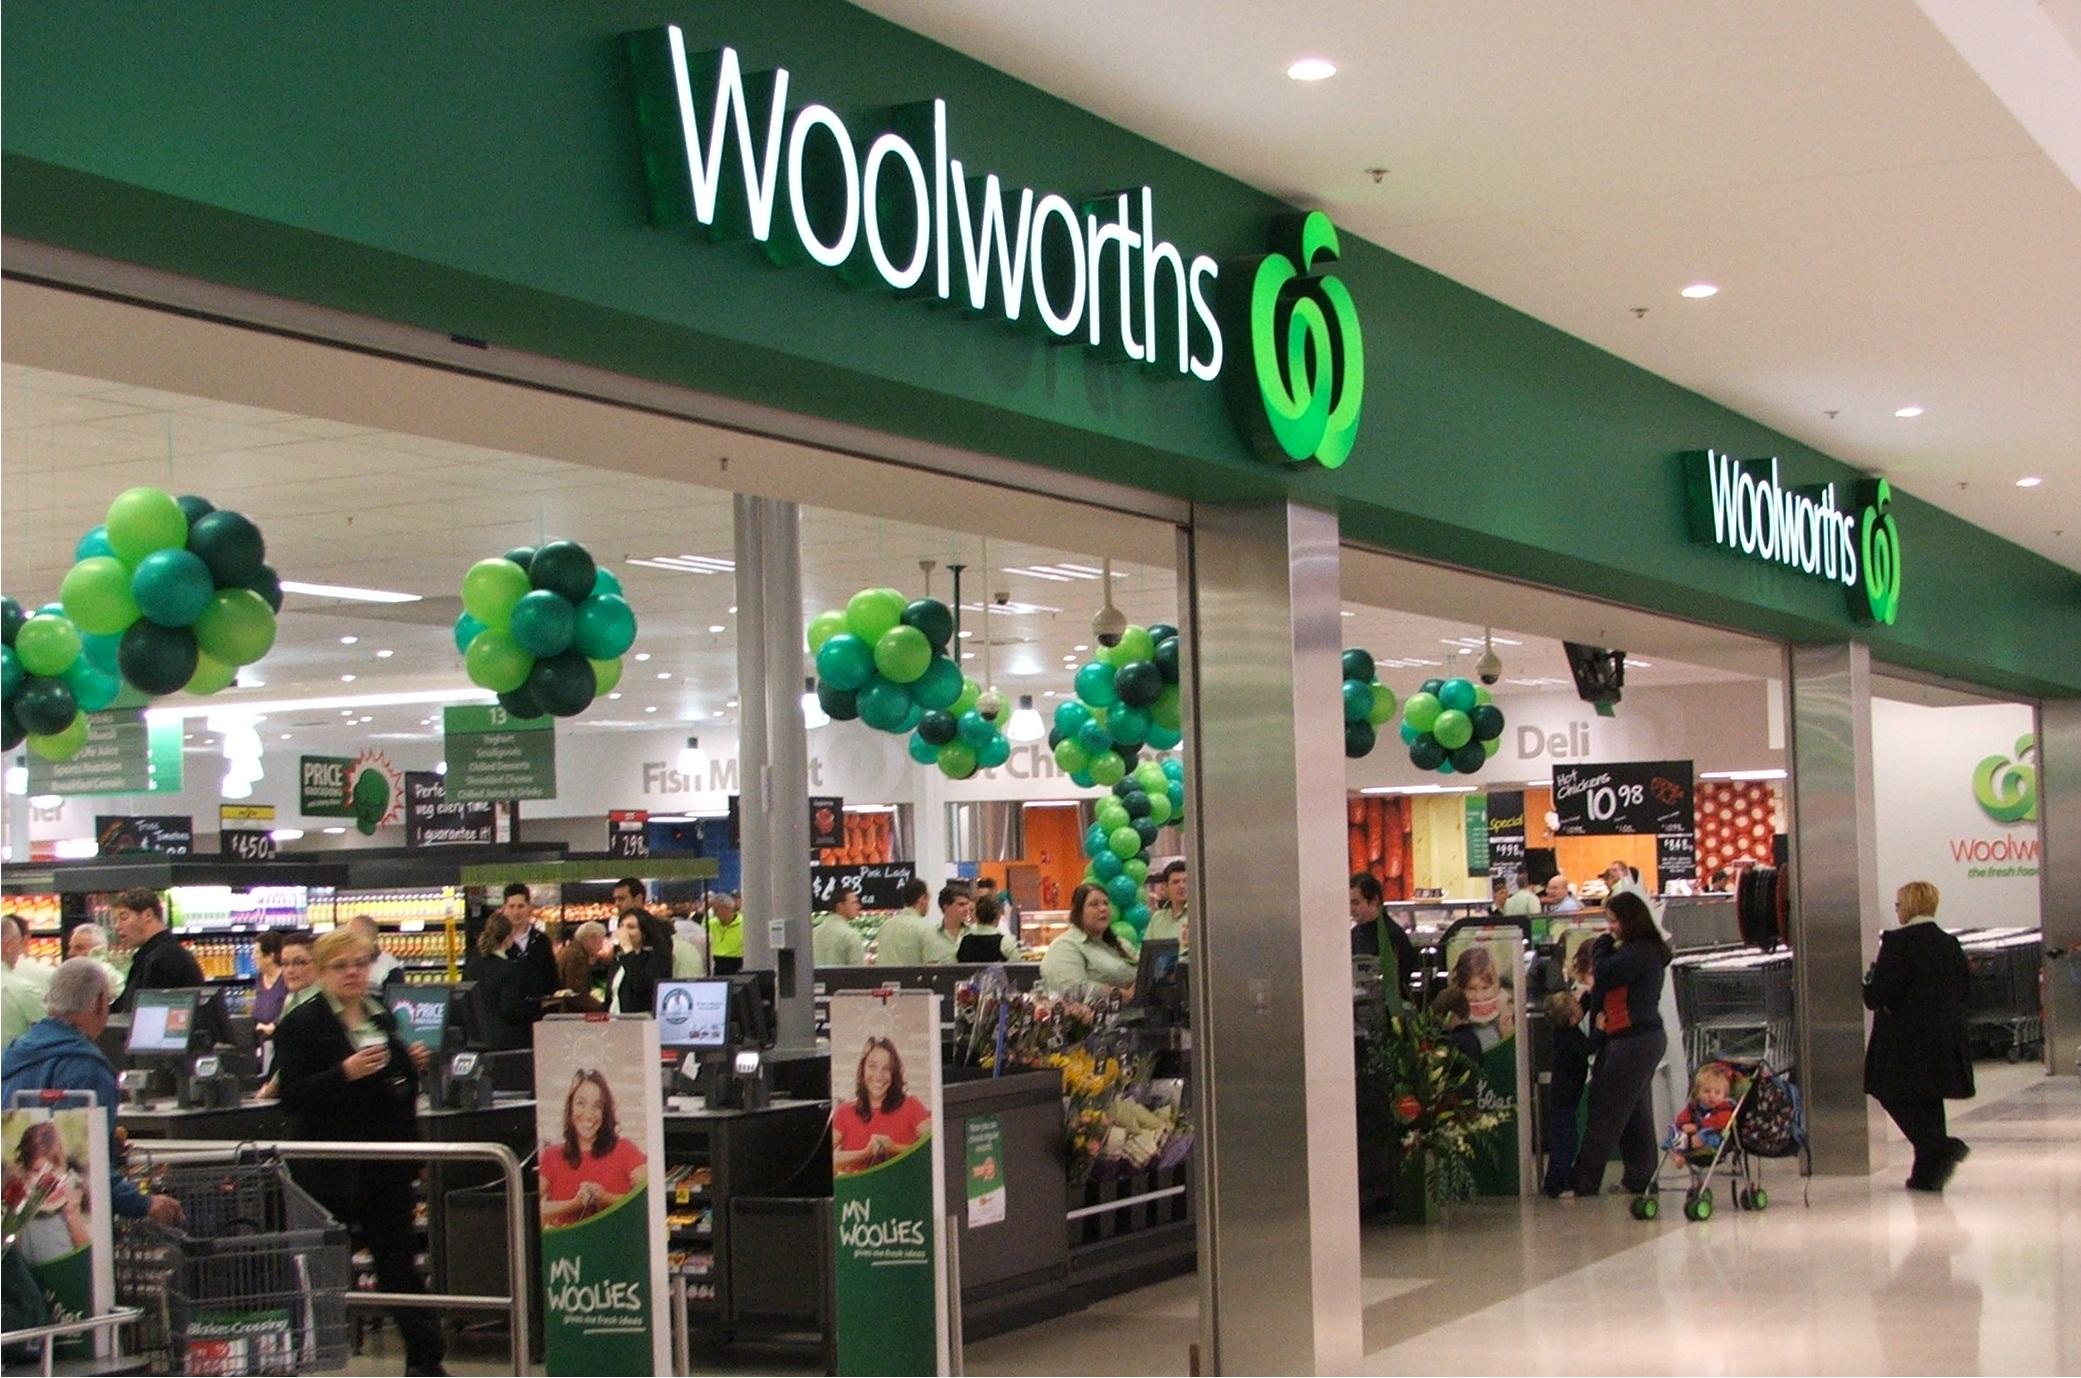 Woolworths in Australia